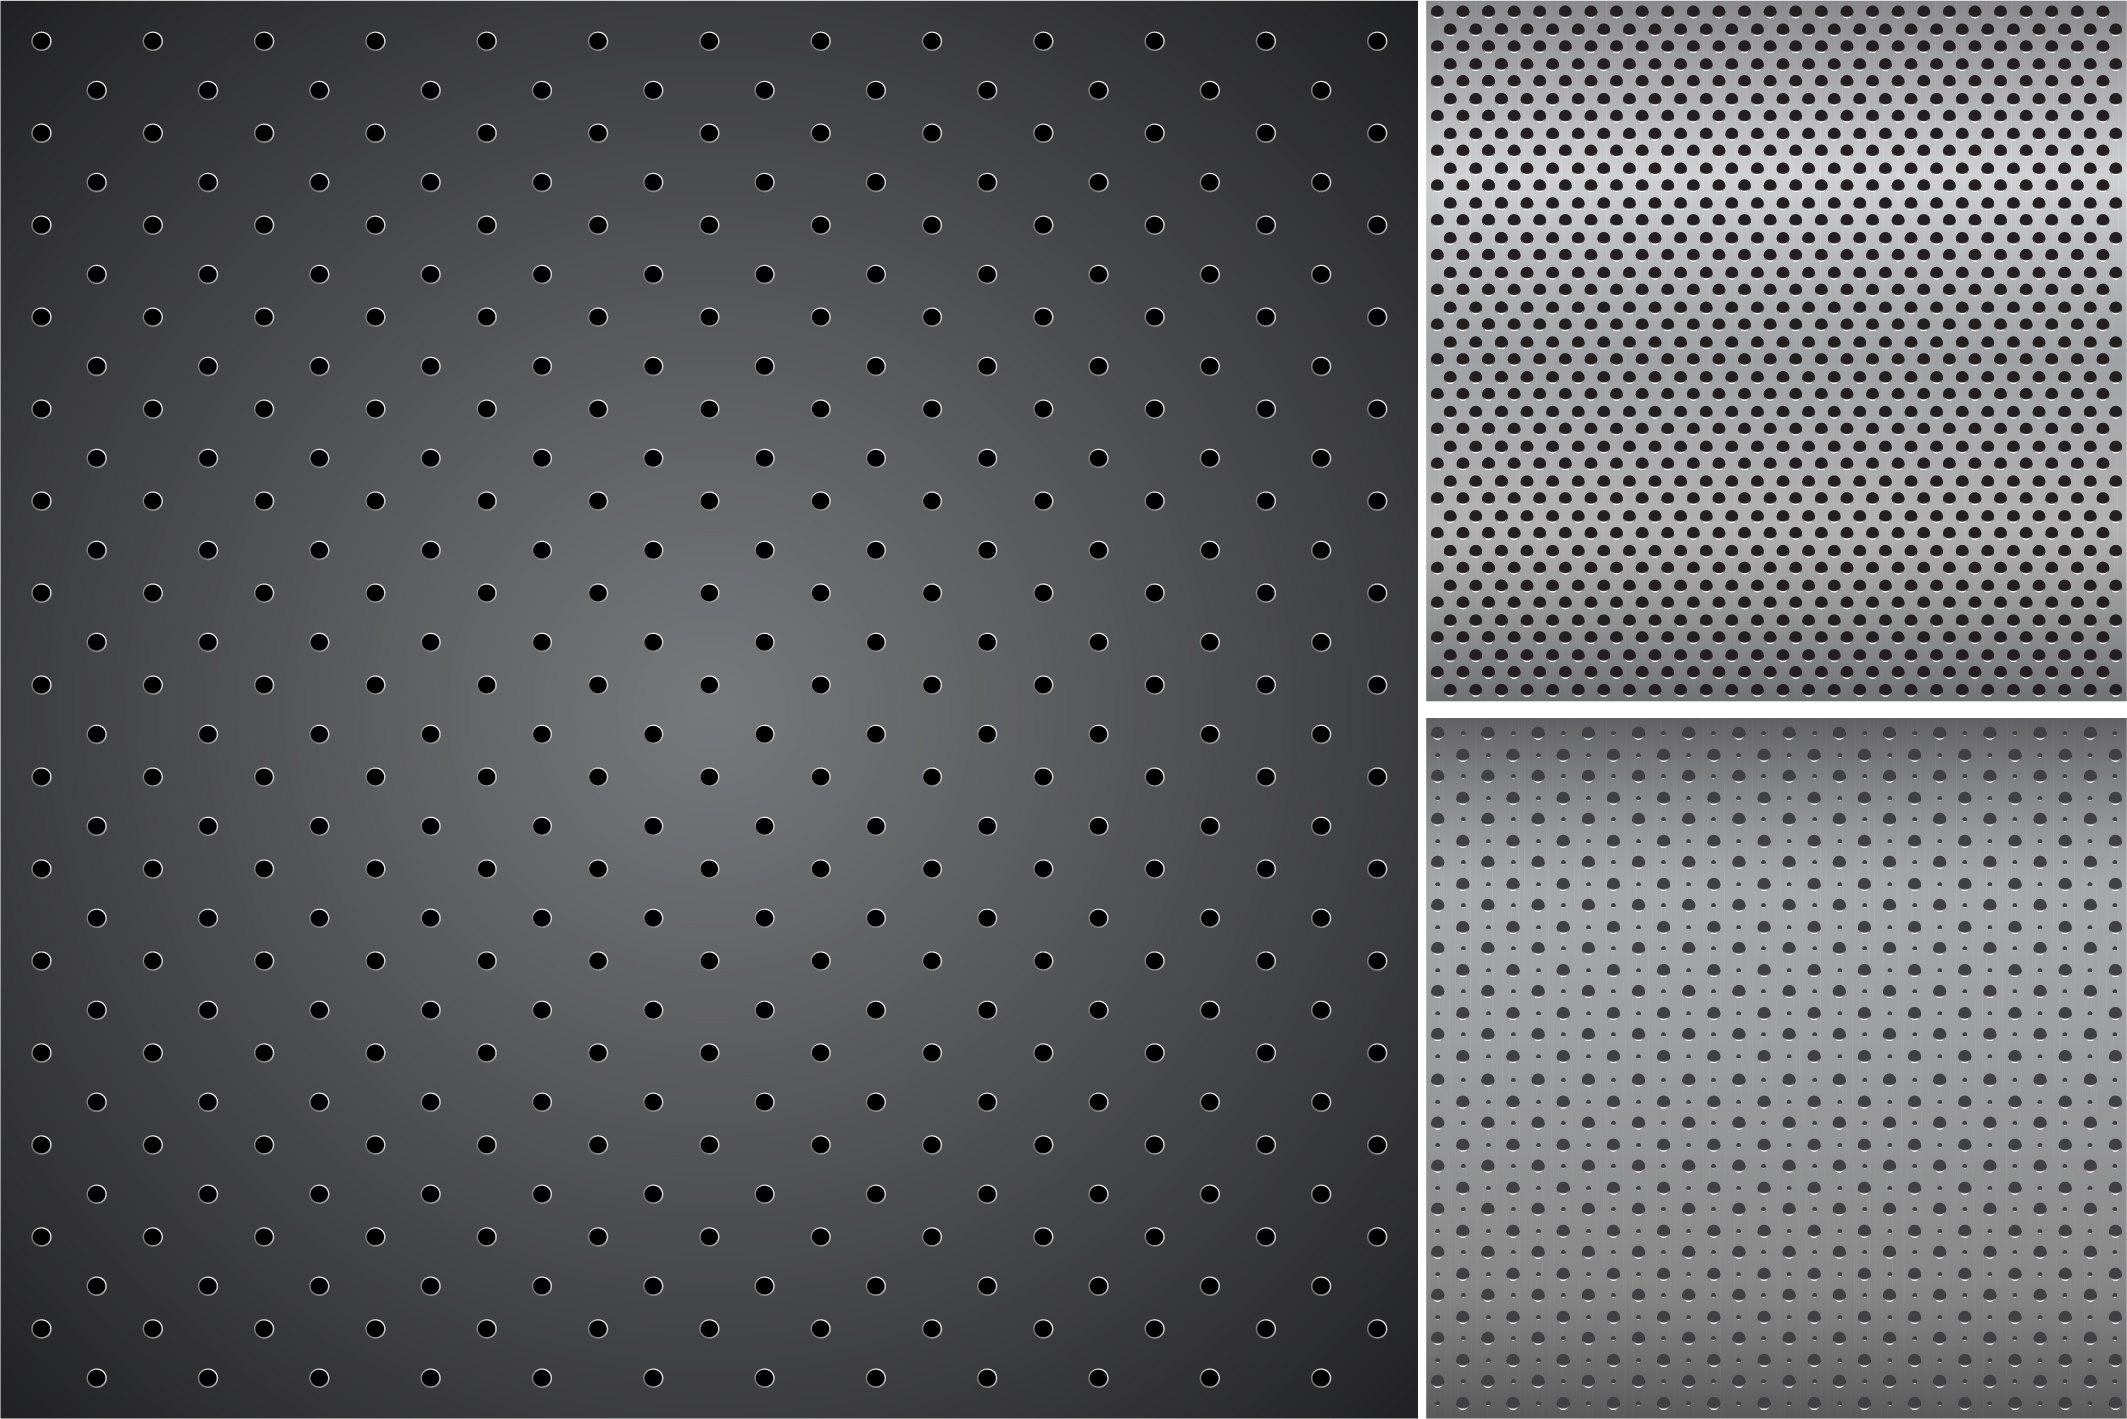 Metallic dark textures with holes. example image 8